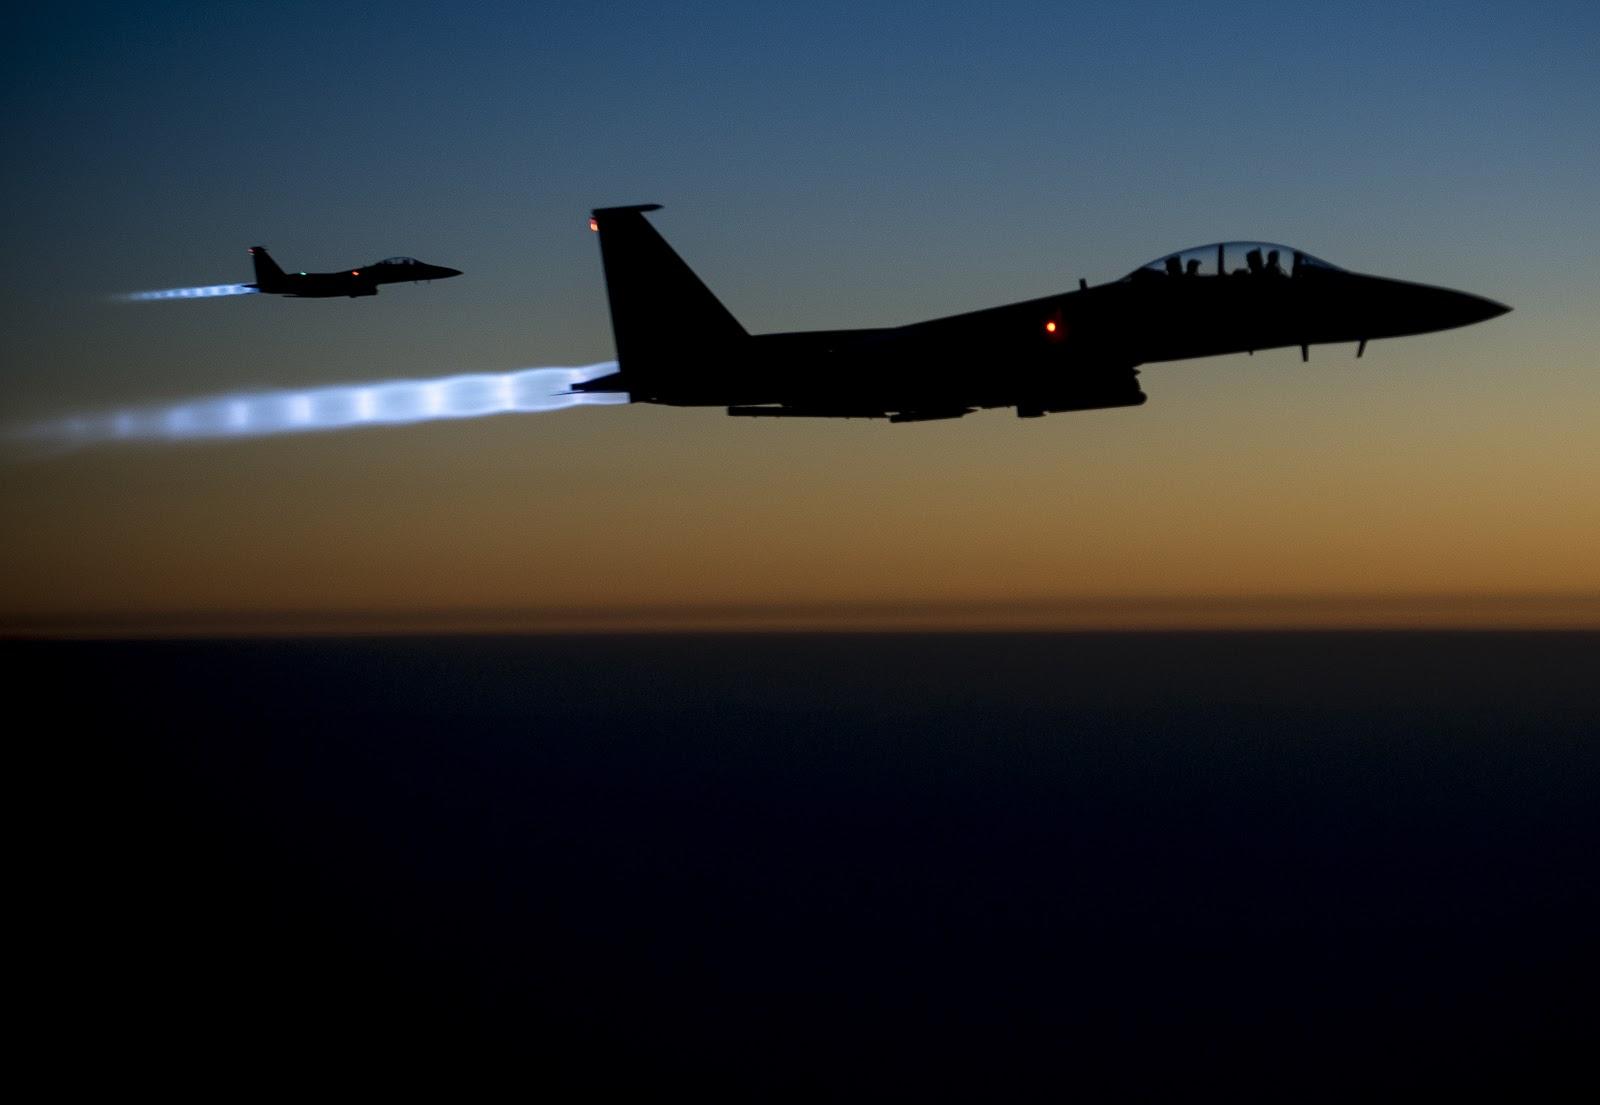 Airstrikes_in_Syria_140923-F-UL677-654.jpg